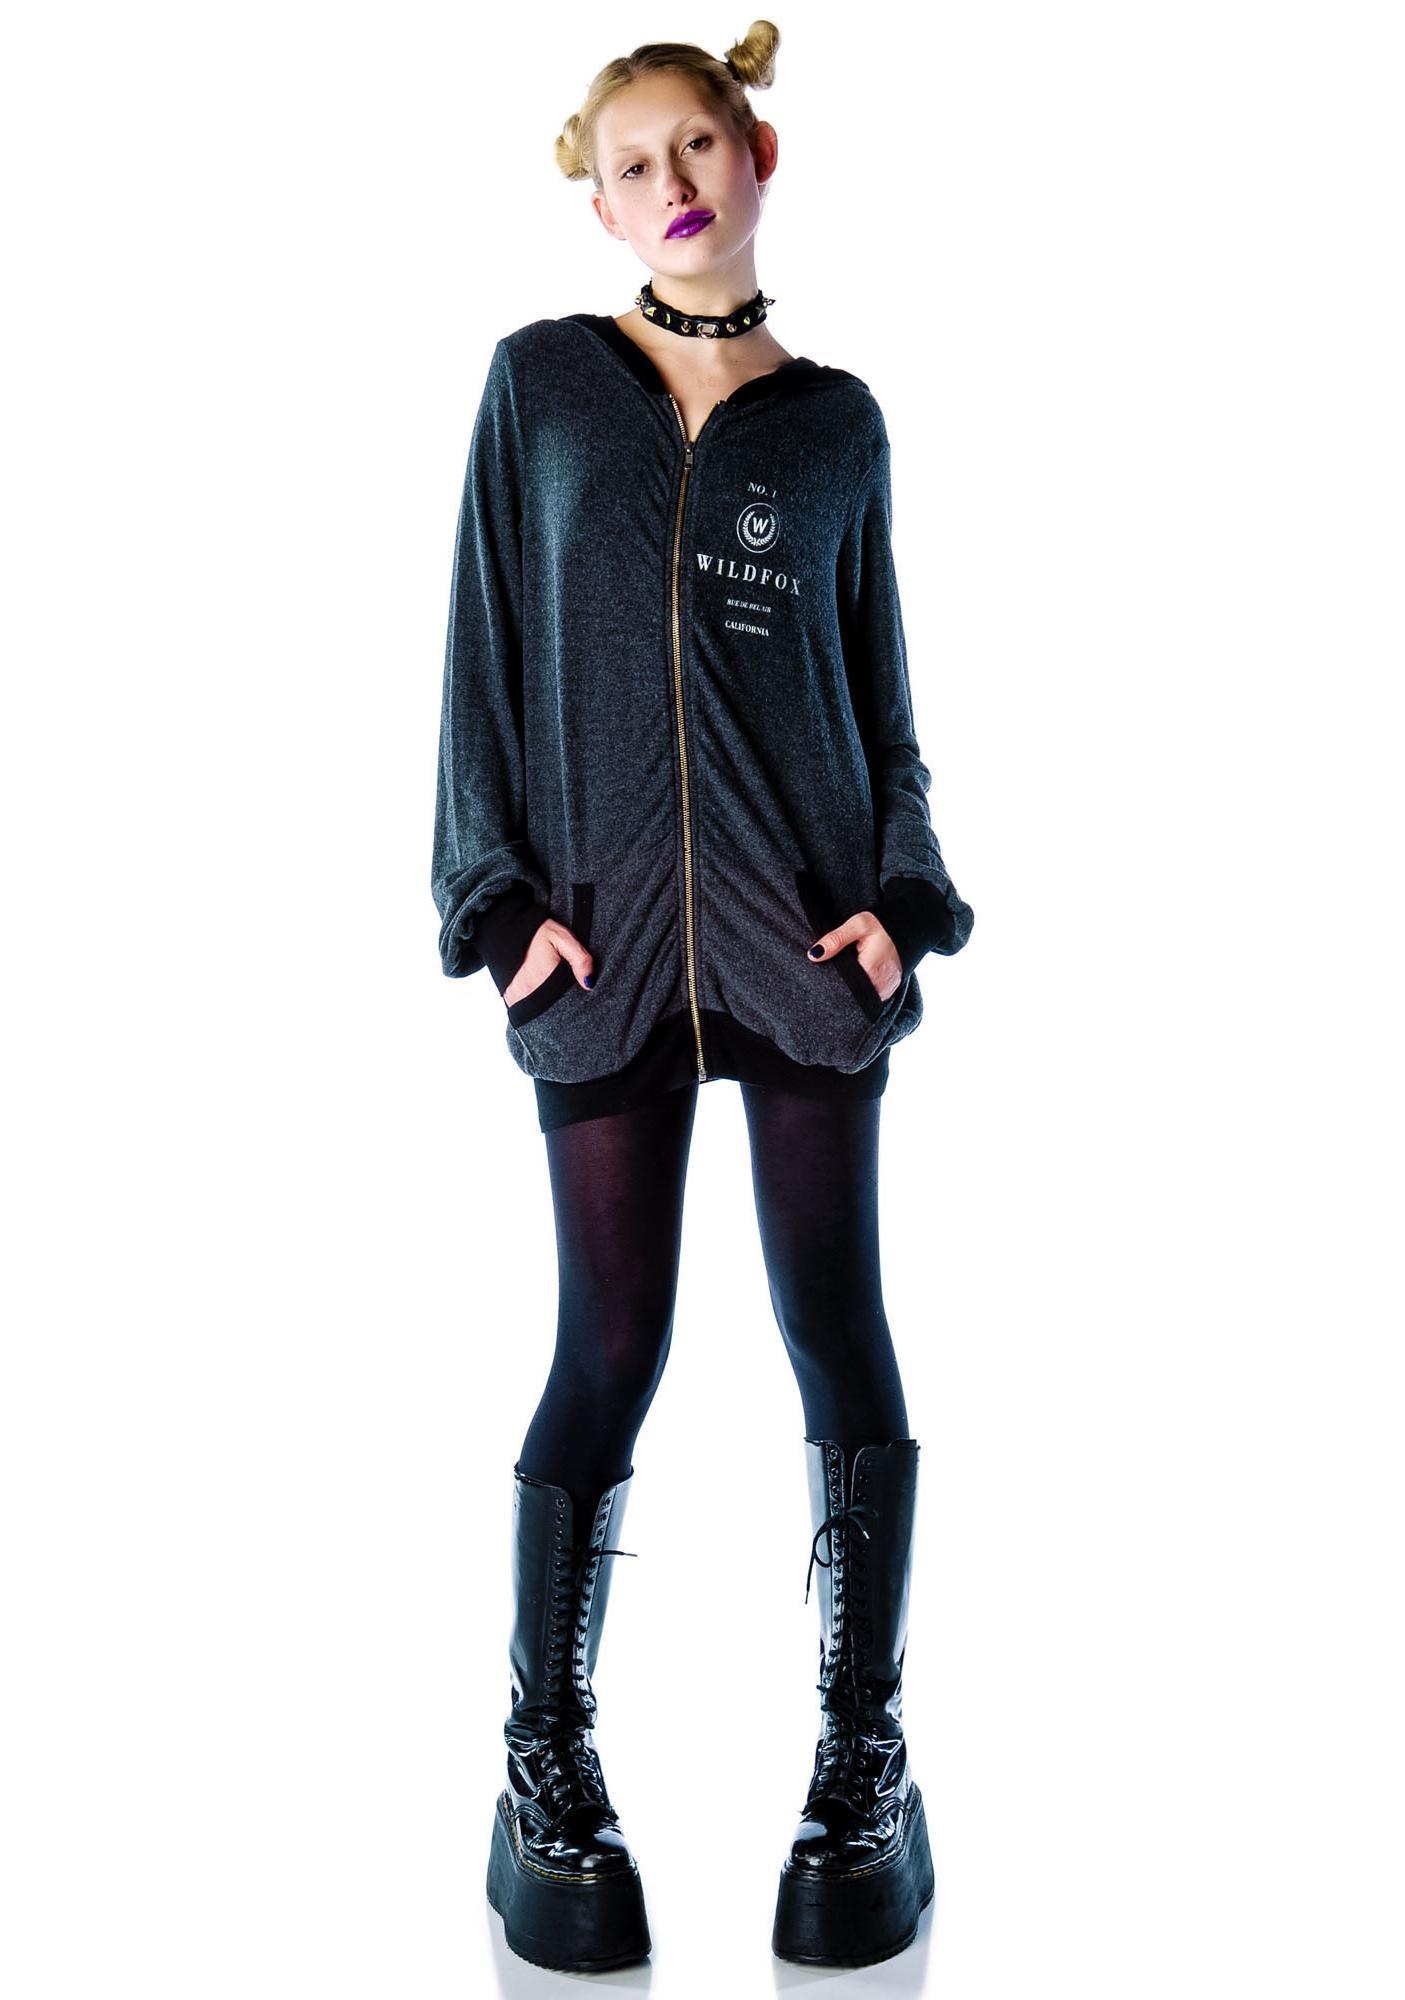 Wildfox Couture Rue De Bel Air Grunge Zip Up Hoodie